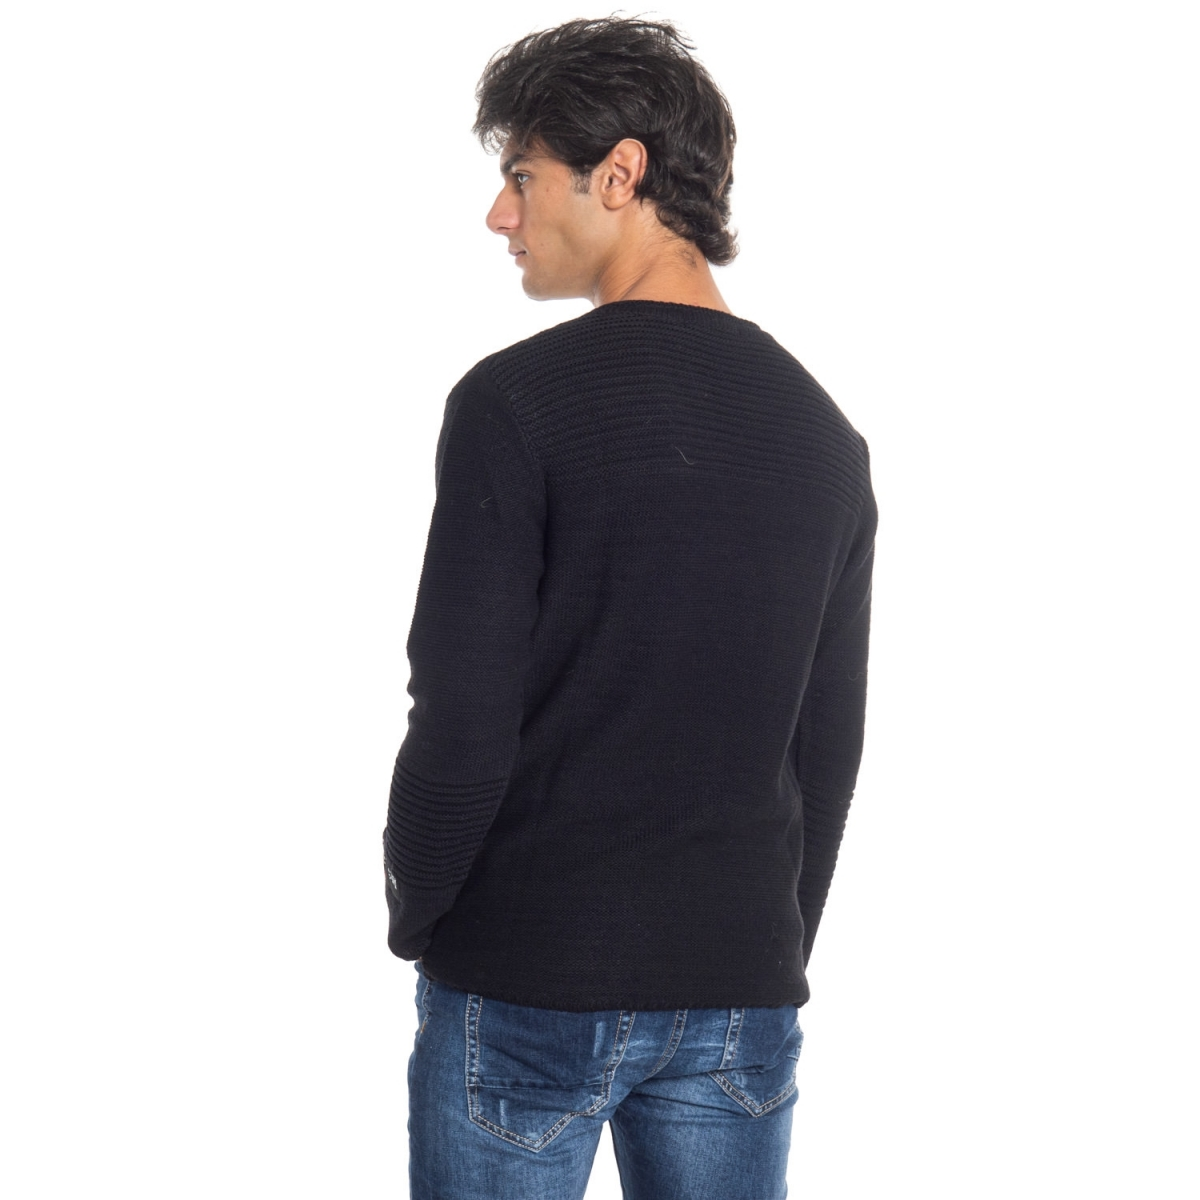 clothing Knitwears men Maglia GLBW807 GIANNI LUPO Cafedelmar Shop